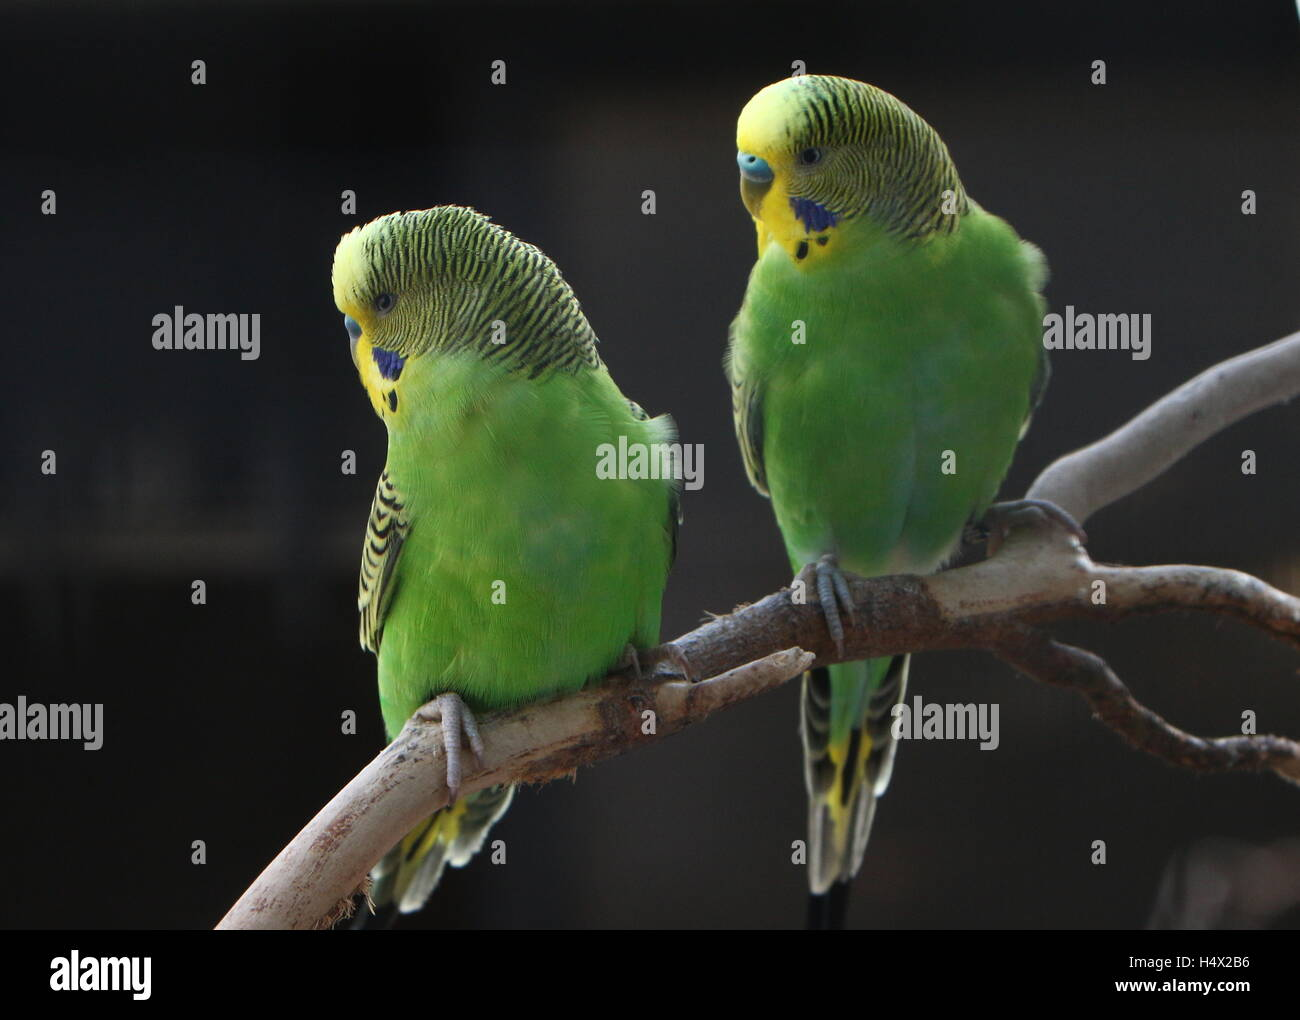 Pair of male Australian Budgerigar Parakeets (Melopsittacus undulatus) Stock Photo